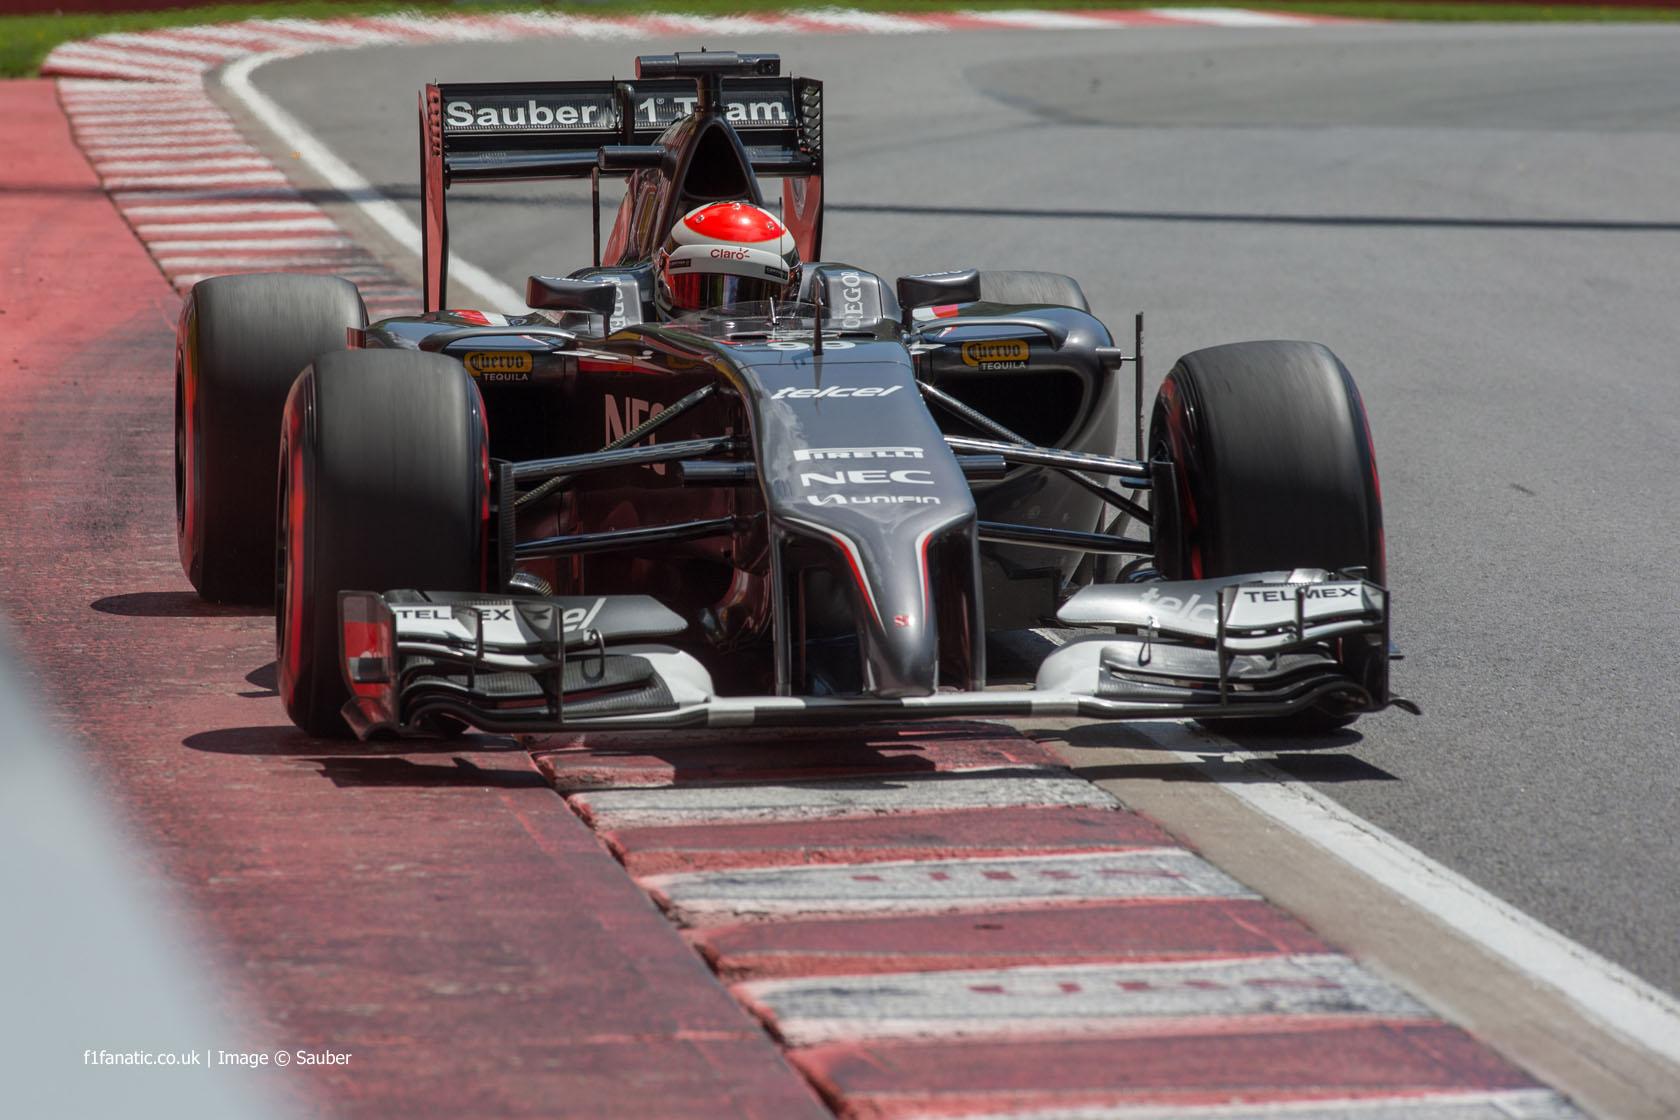 Adrian Sutil, Sauber, Circuit Gilles Villeneuve, 2014